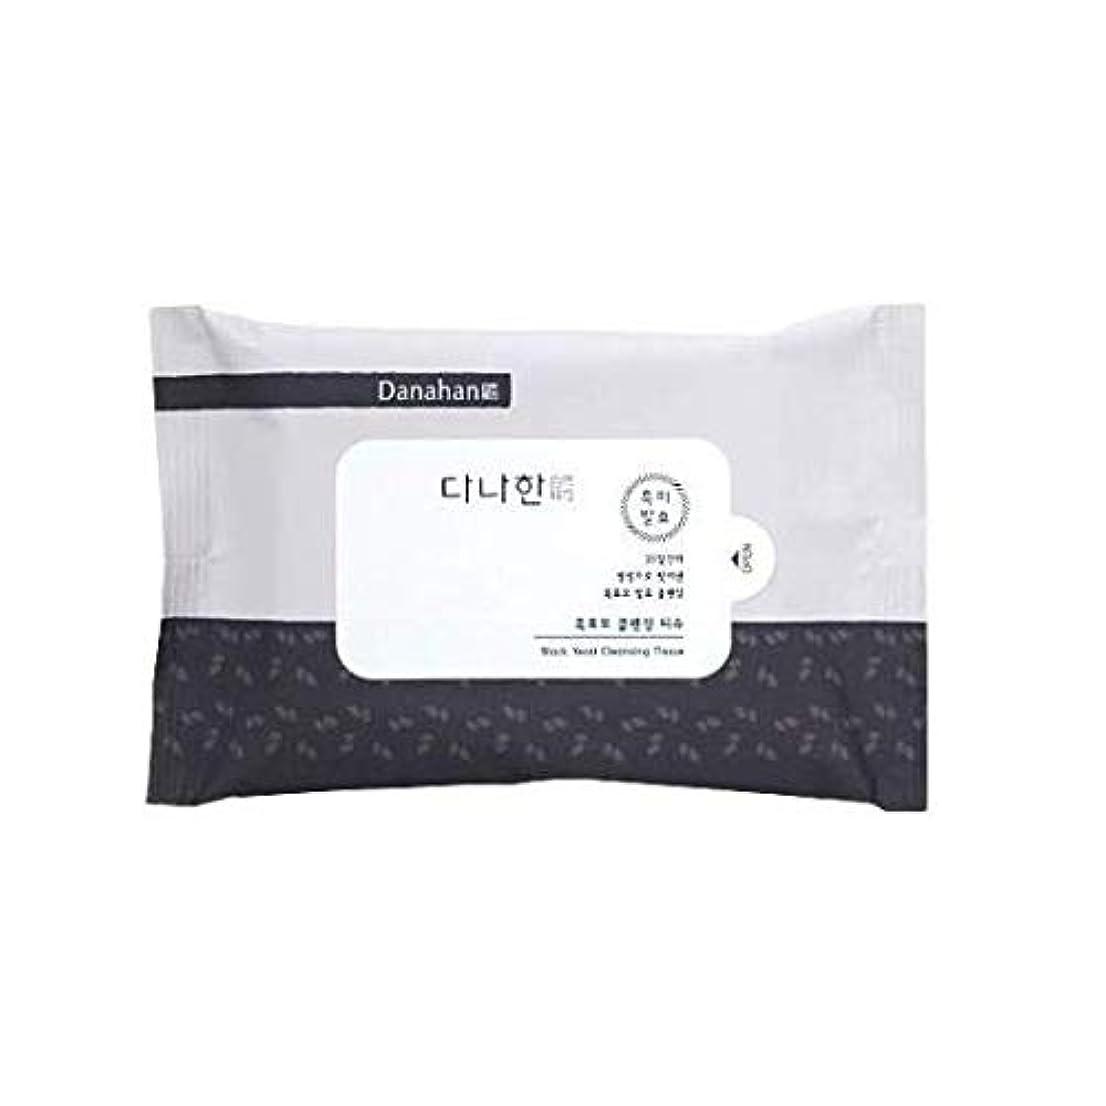 [8EA] 多娜嫺 (ダナハン) 黒酵母 クレンジング ティッシュ 15枚*8 / Danahan Black Yeast Cleansing Tissue 70g*8 [並行輸入品]